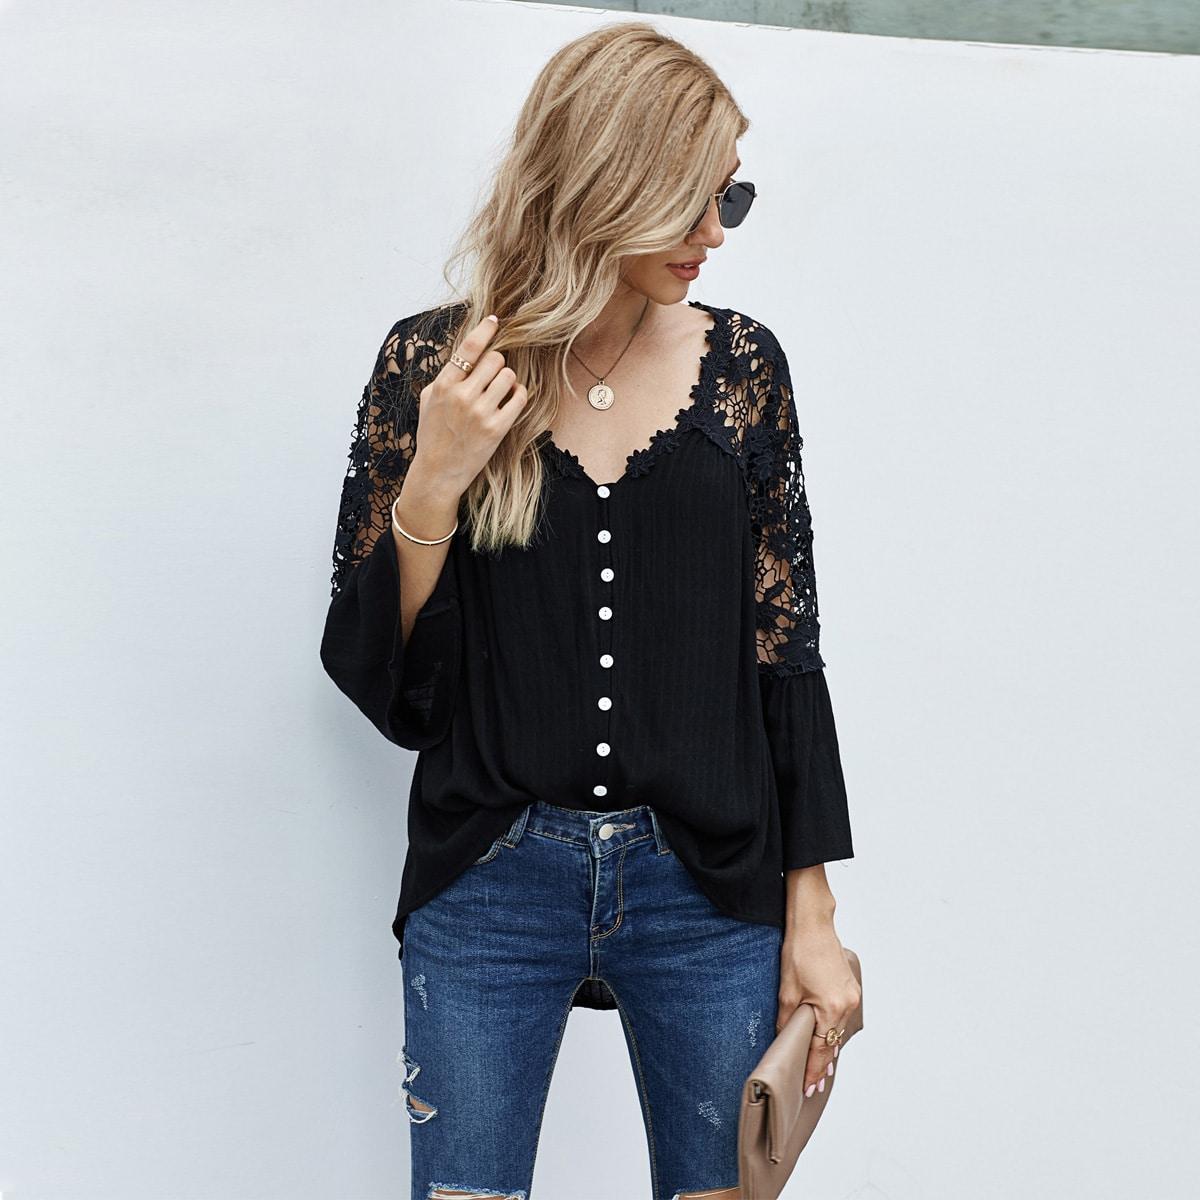 Блуза с пуговицами и кружевом SheIn swblouse23200803419